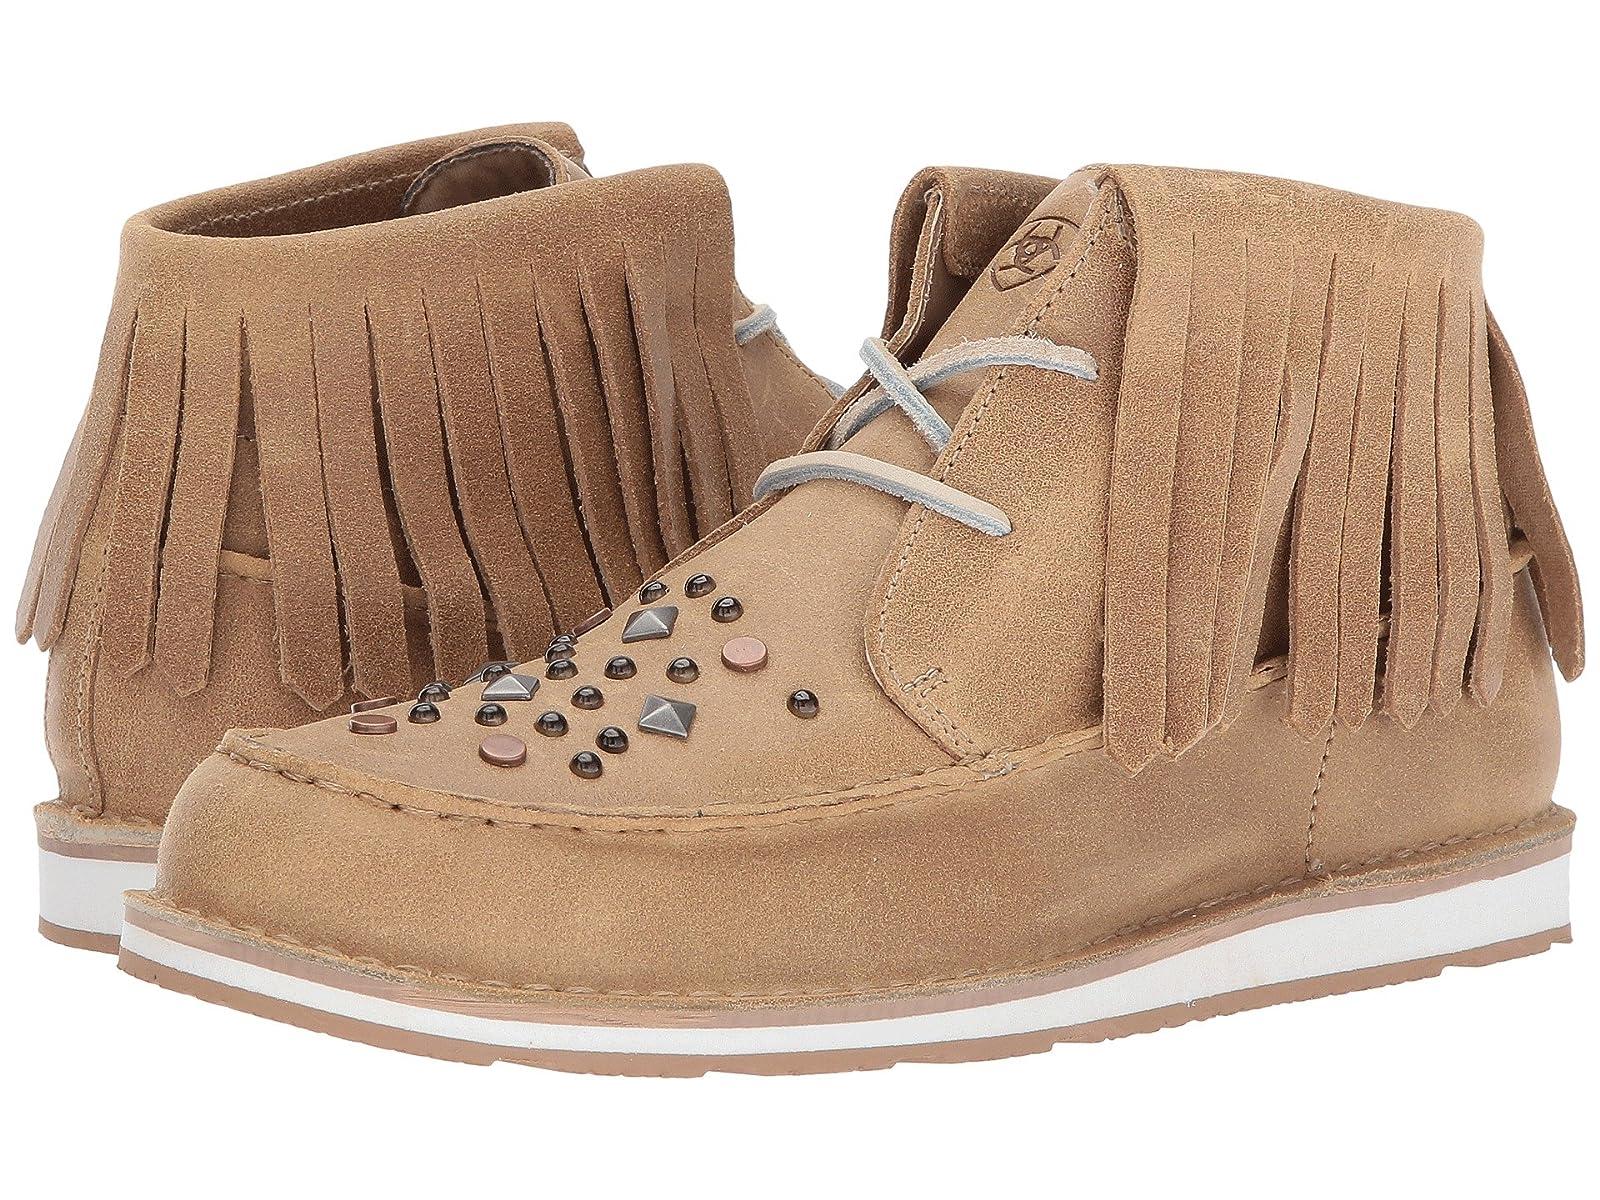 Ariat Cruiser ChukkaCheap and distinctive eye-catching shoes